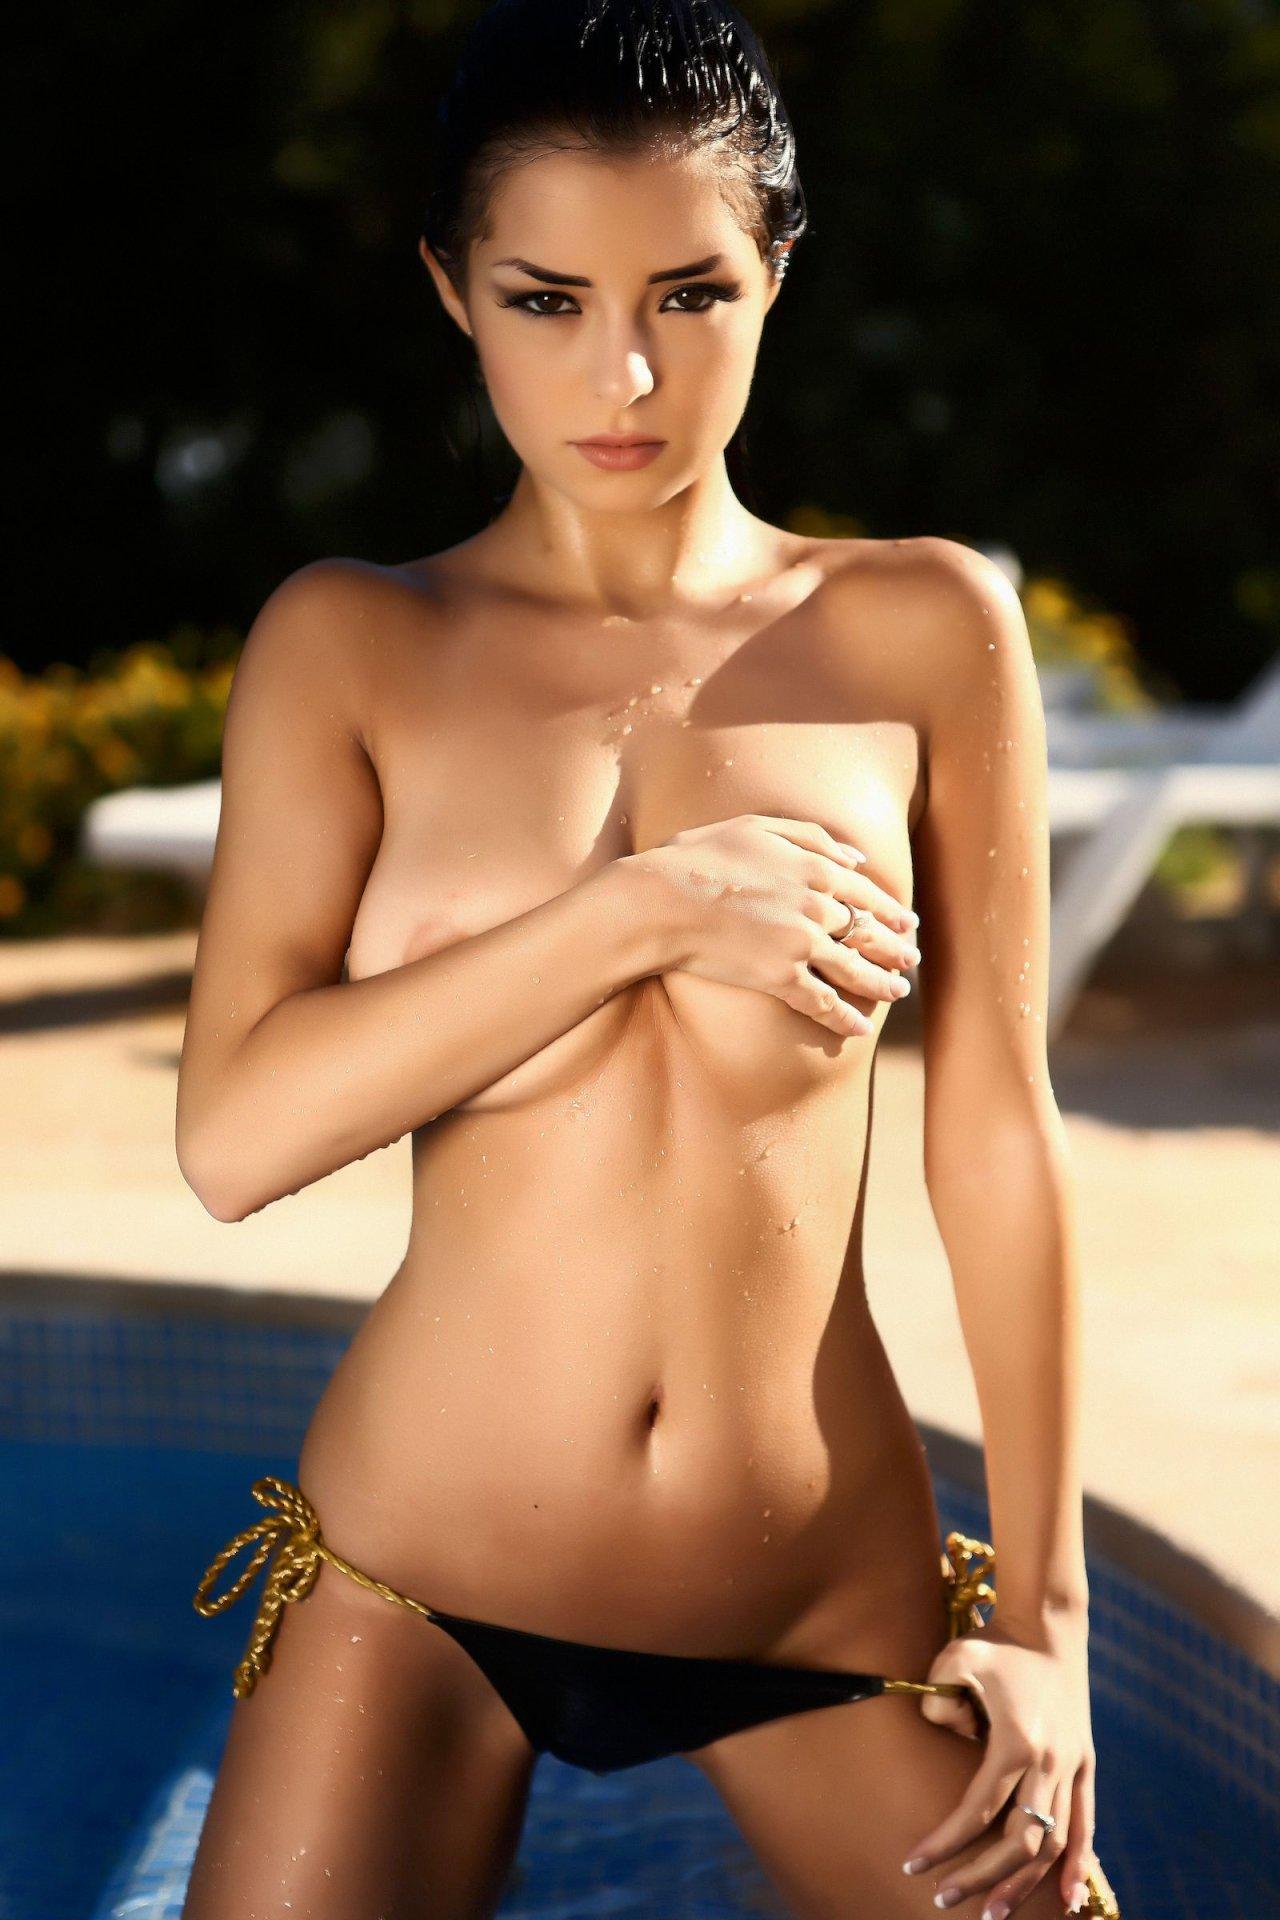 http://www.hotcelebshome.com/wp-content/uploads/2018/05/Demi-Rose-Mawby-Topless.jpeg